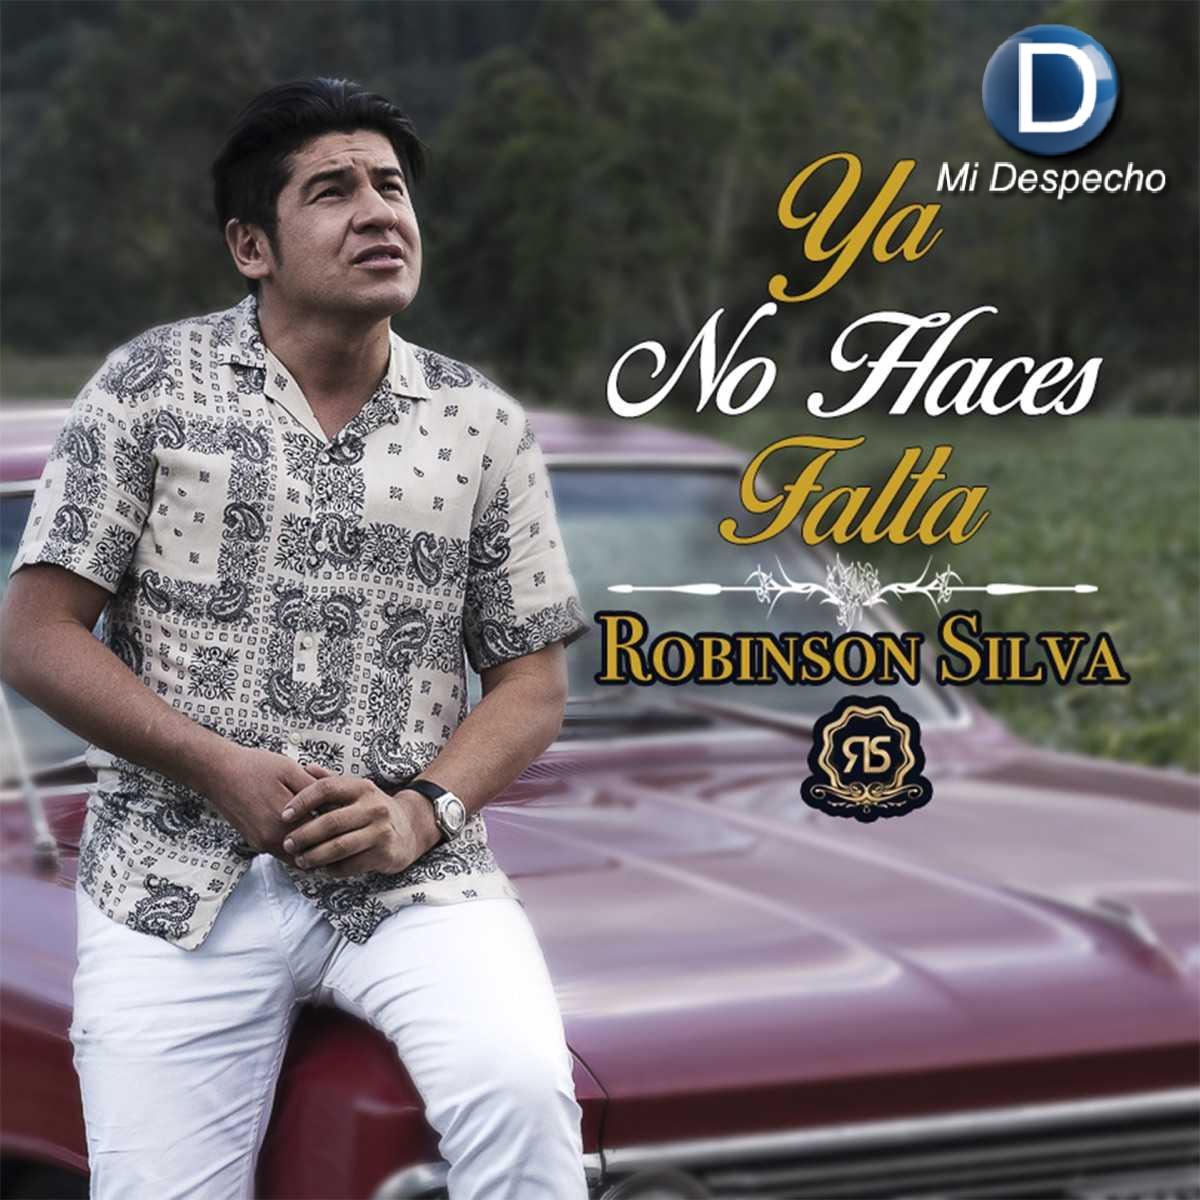 Robinson Silva Ya No Haces Falta Frontal